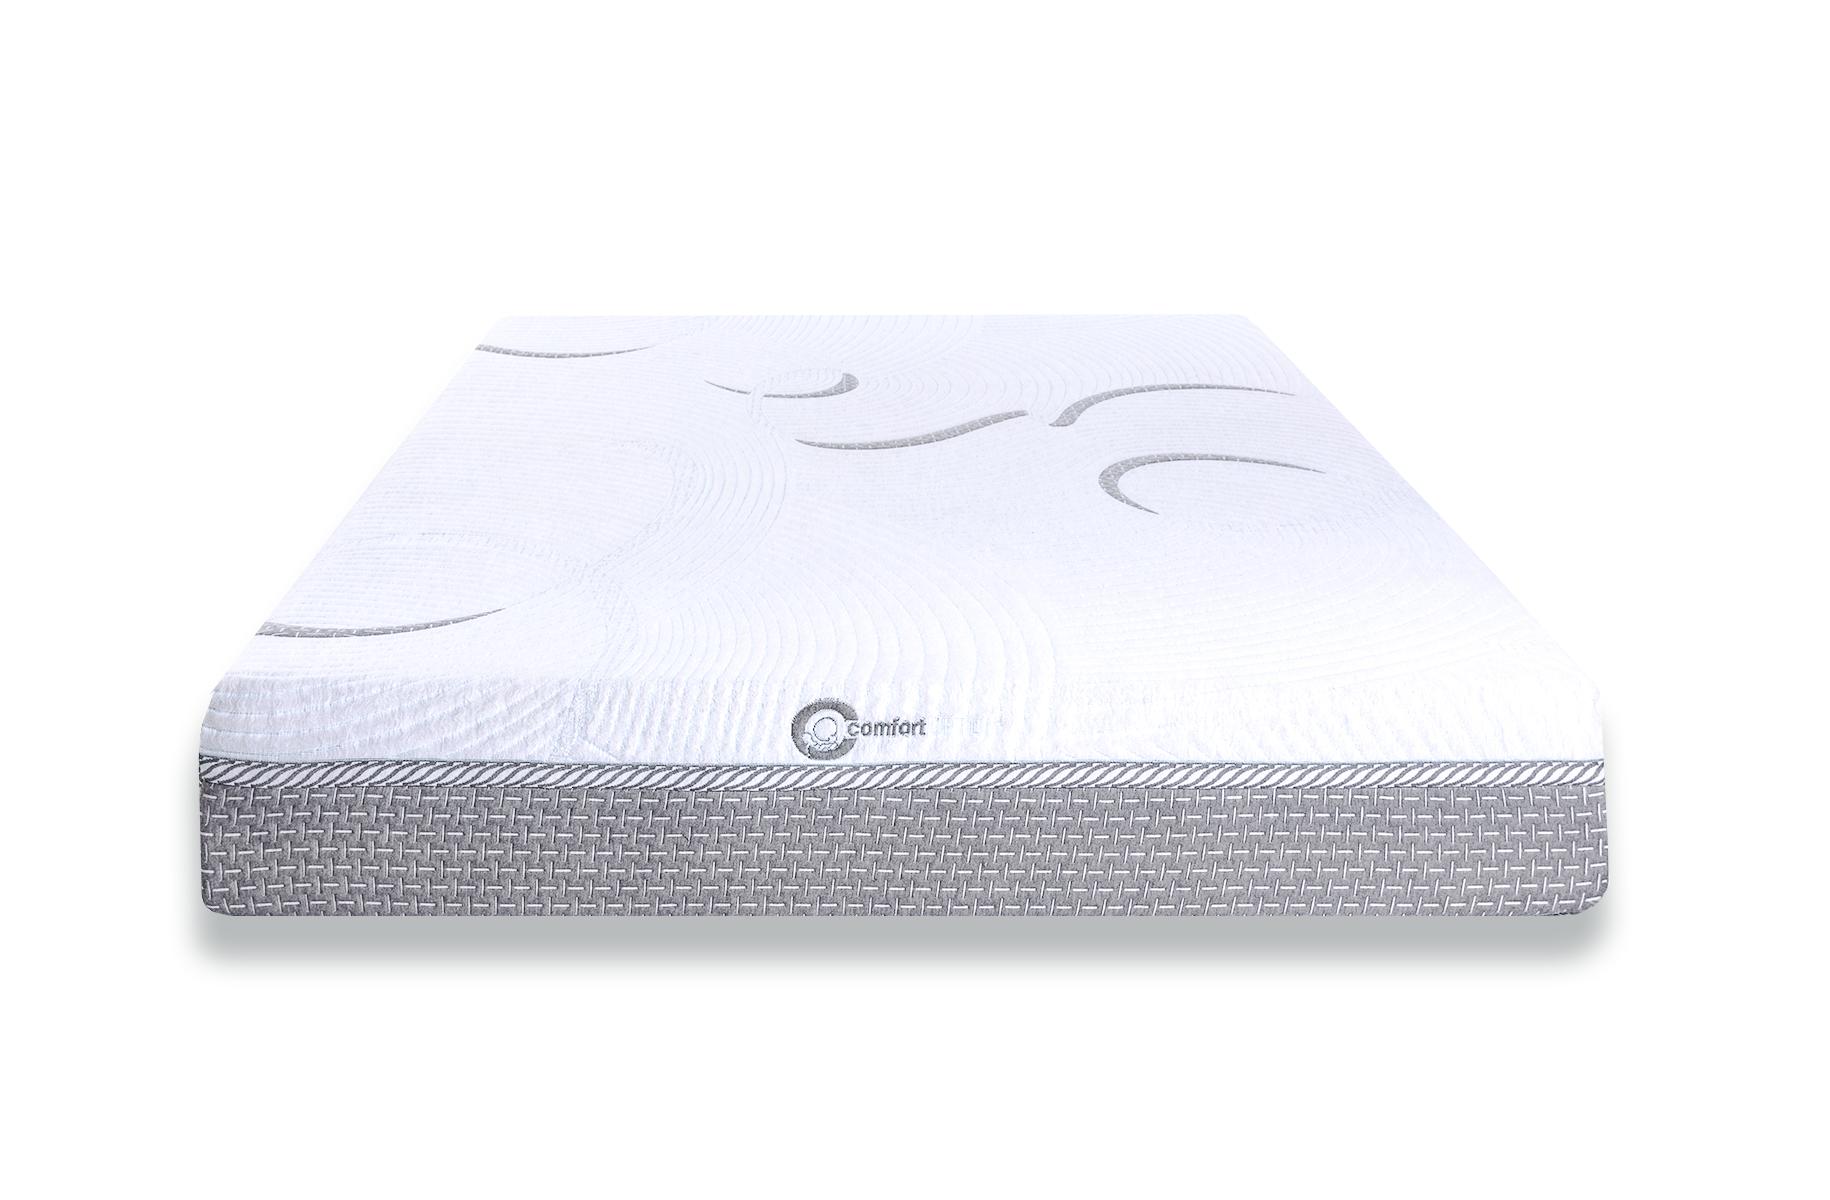 Quality, Comfortable Foam Mattresses